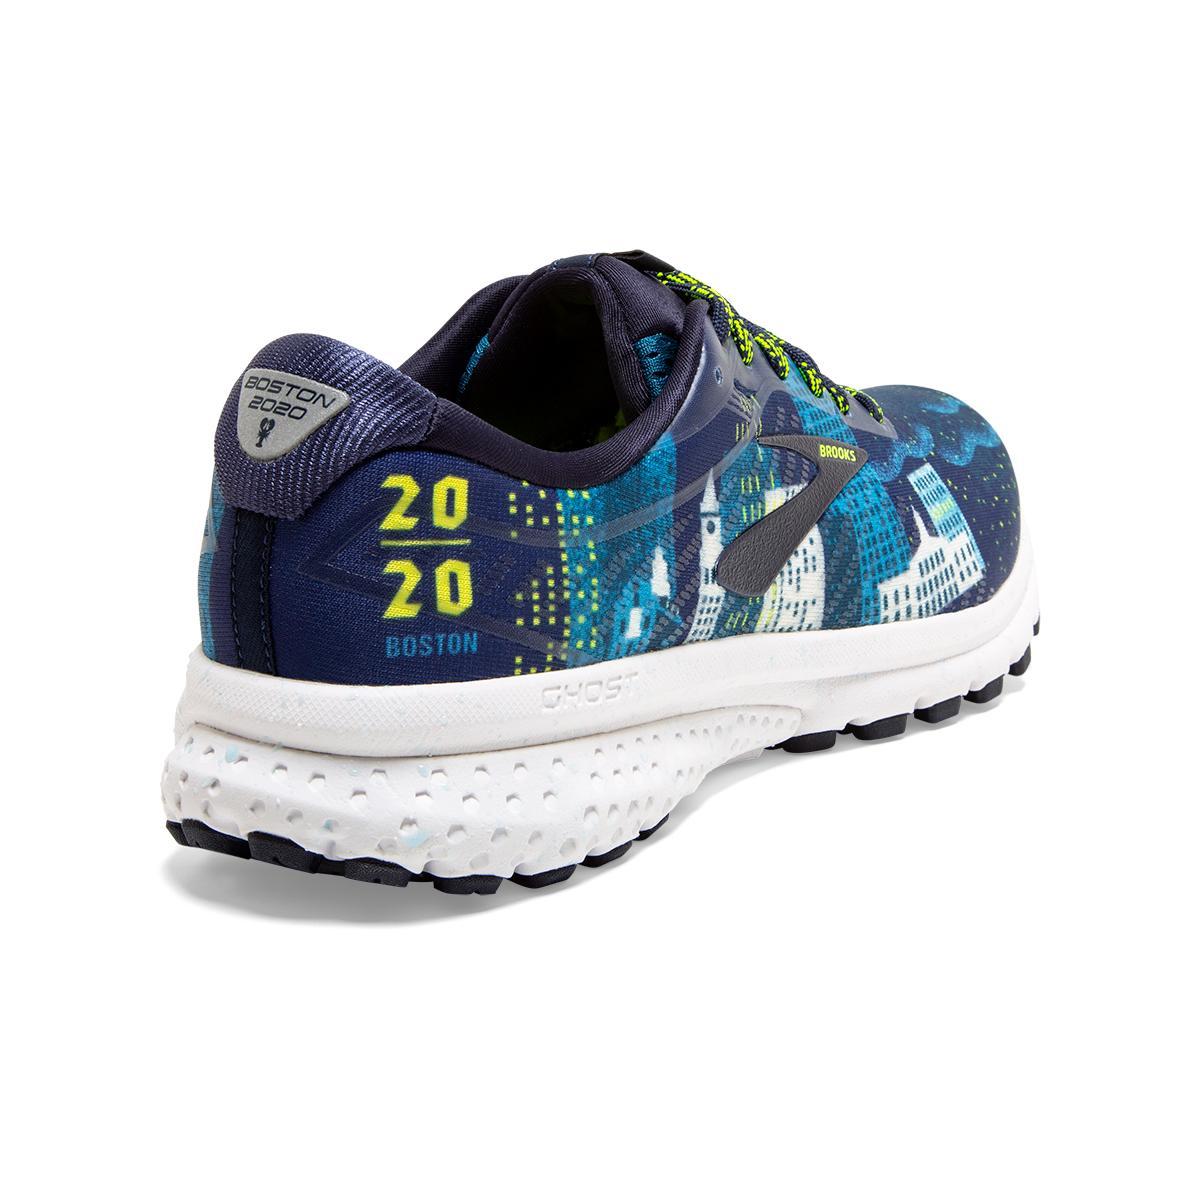 """Brooks Ghost 12 Run Boston Edition"" รองเท้าที่ทำรวมกับงานวิ่งมาราธอนที่เก่าแก่ที่สุดในโลก 03"